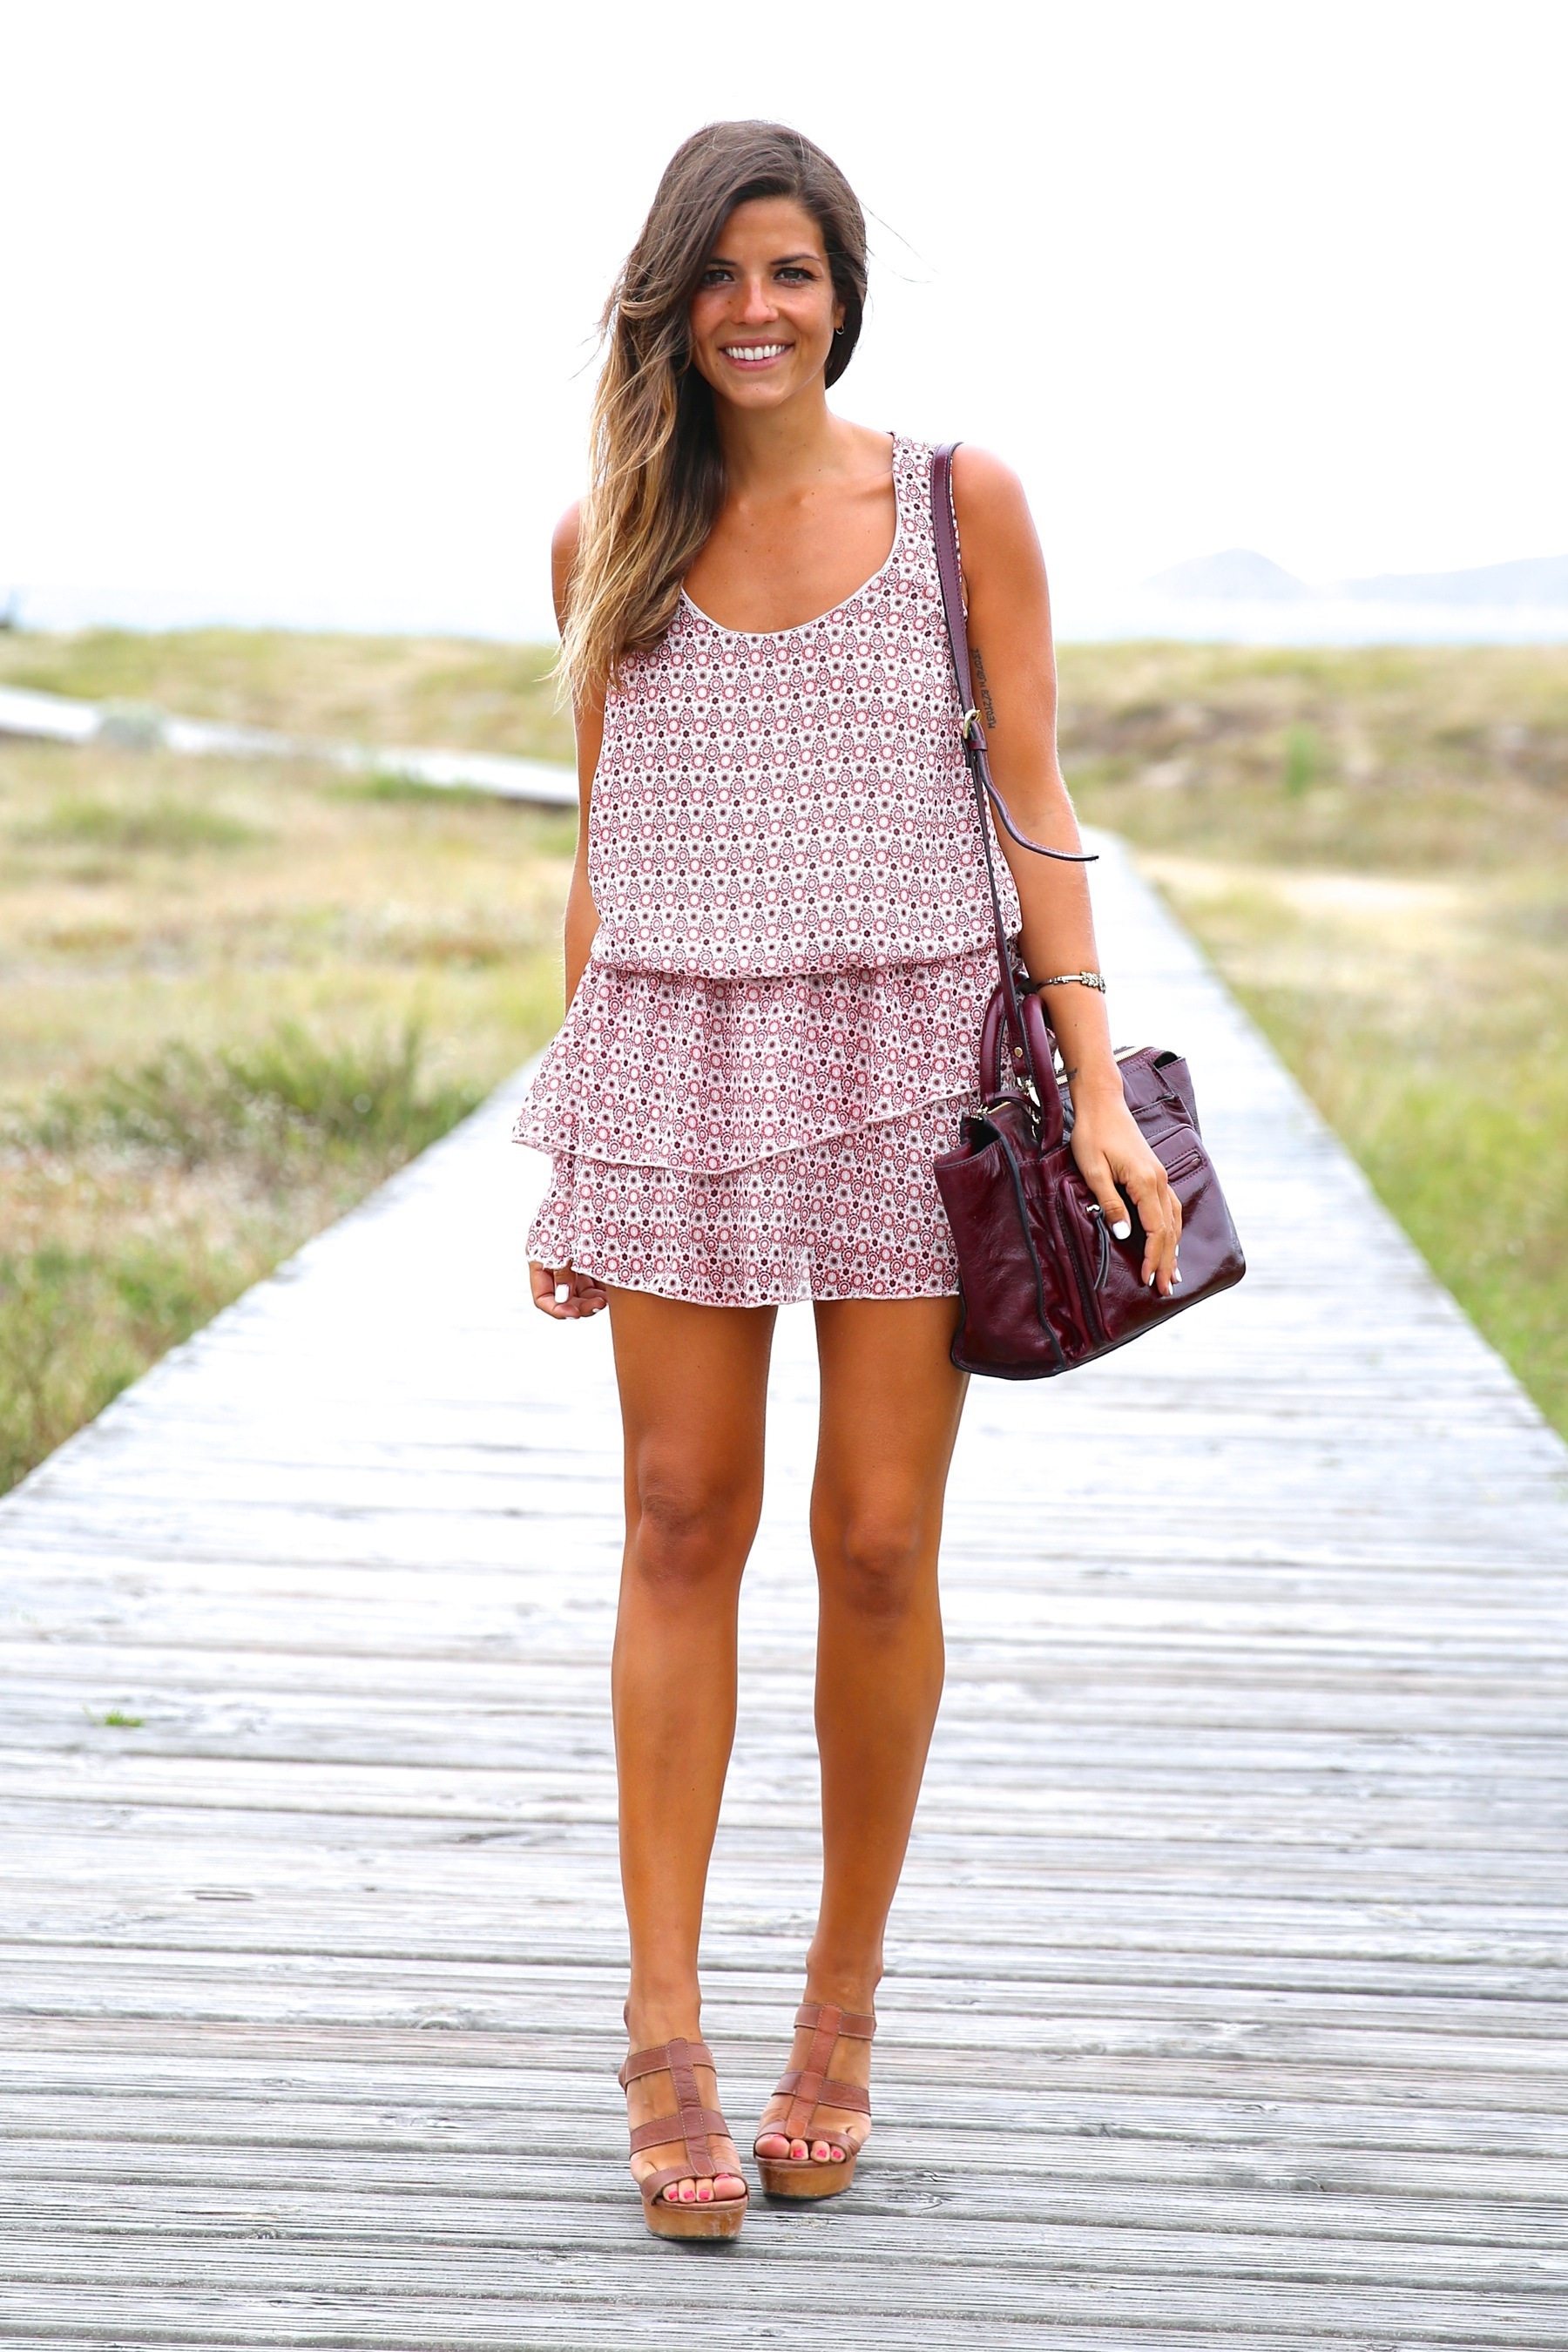 trendy_taste-look-outfit-street_style-ootd-blog-blogger-fashion_spain-moda_españa-boho-beach-playa-galicia-vestido-dress-sandalias-sandals-14